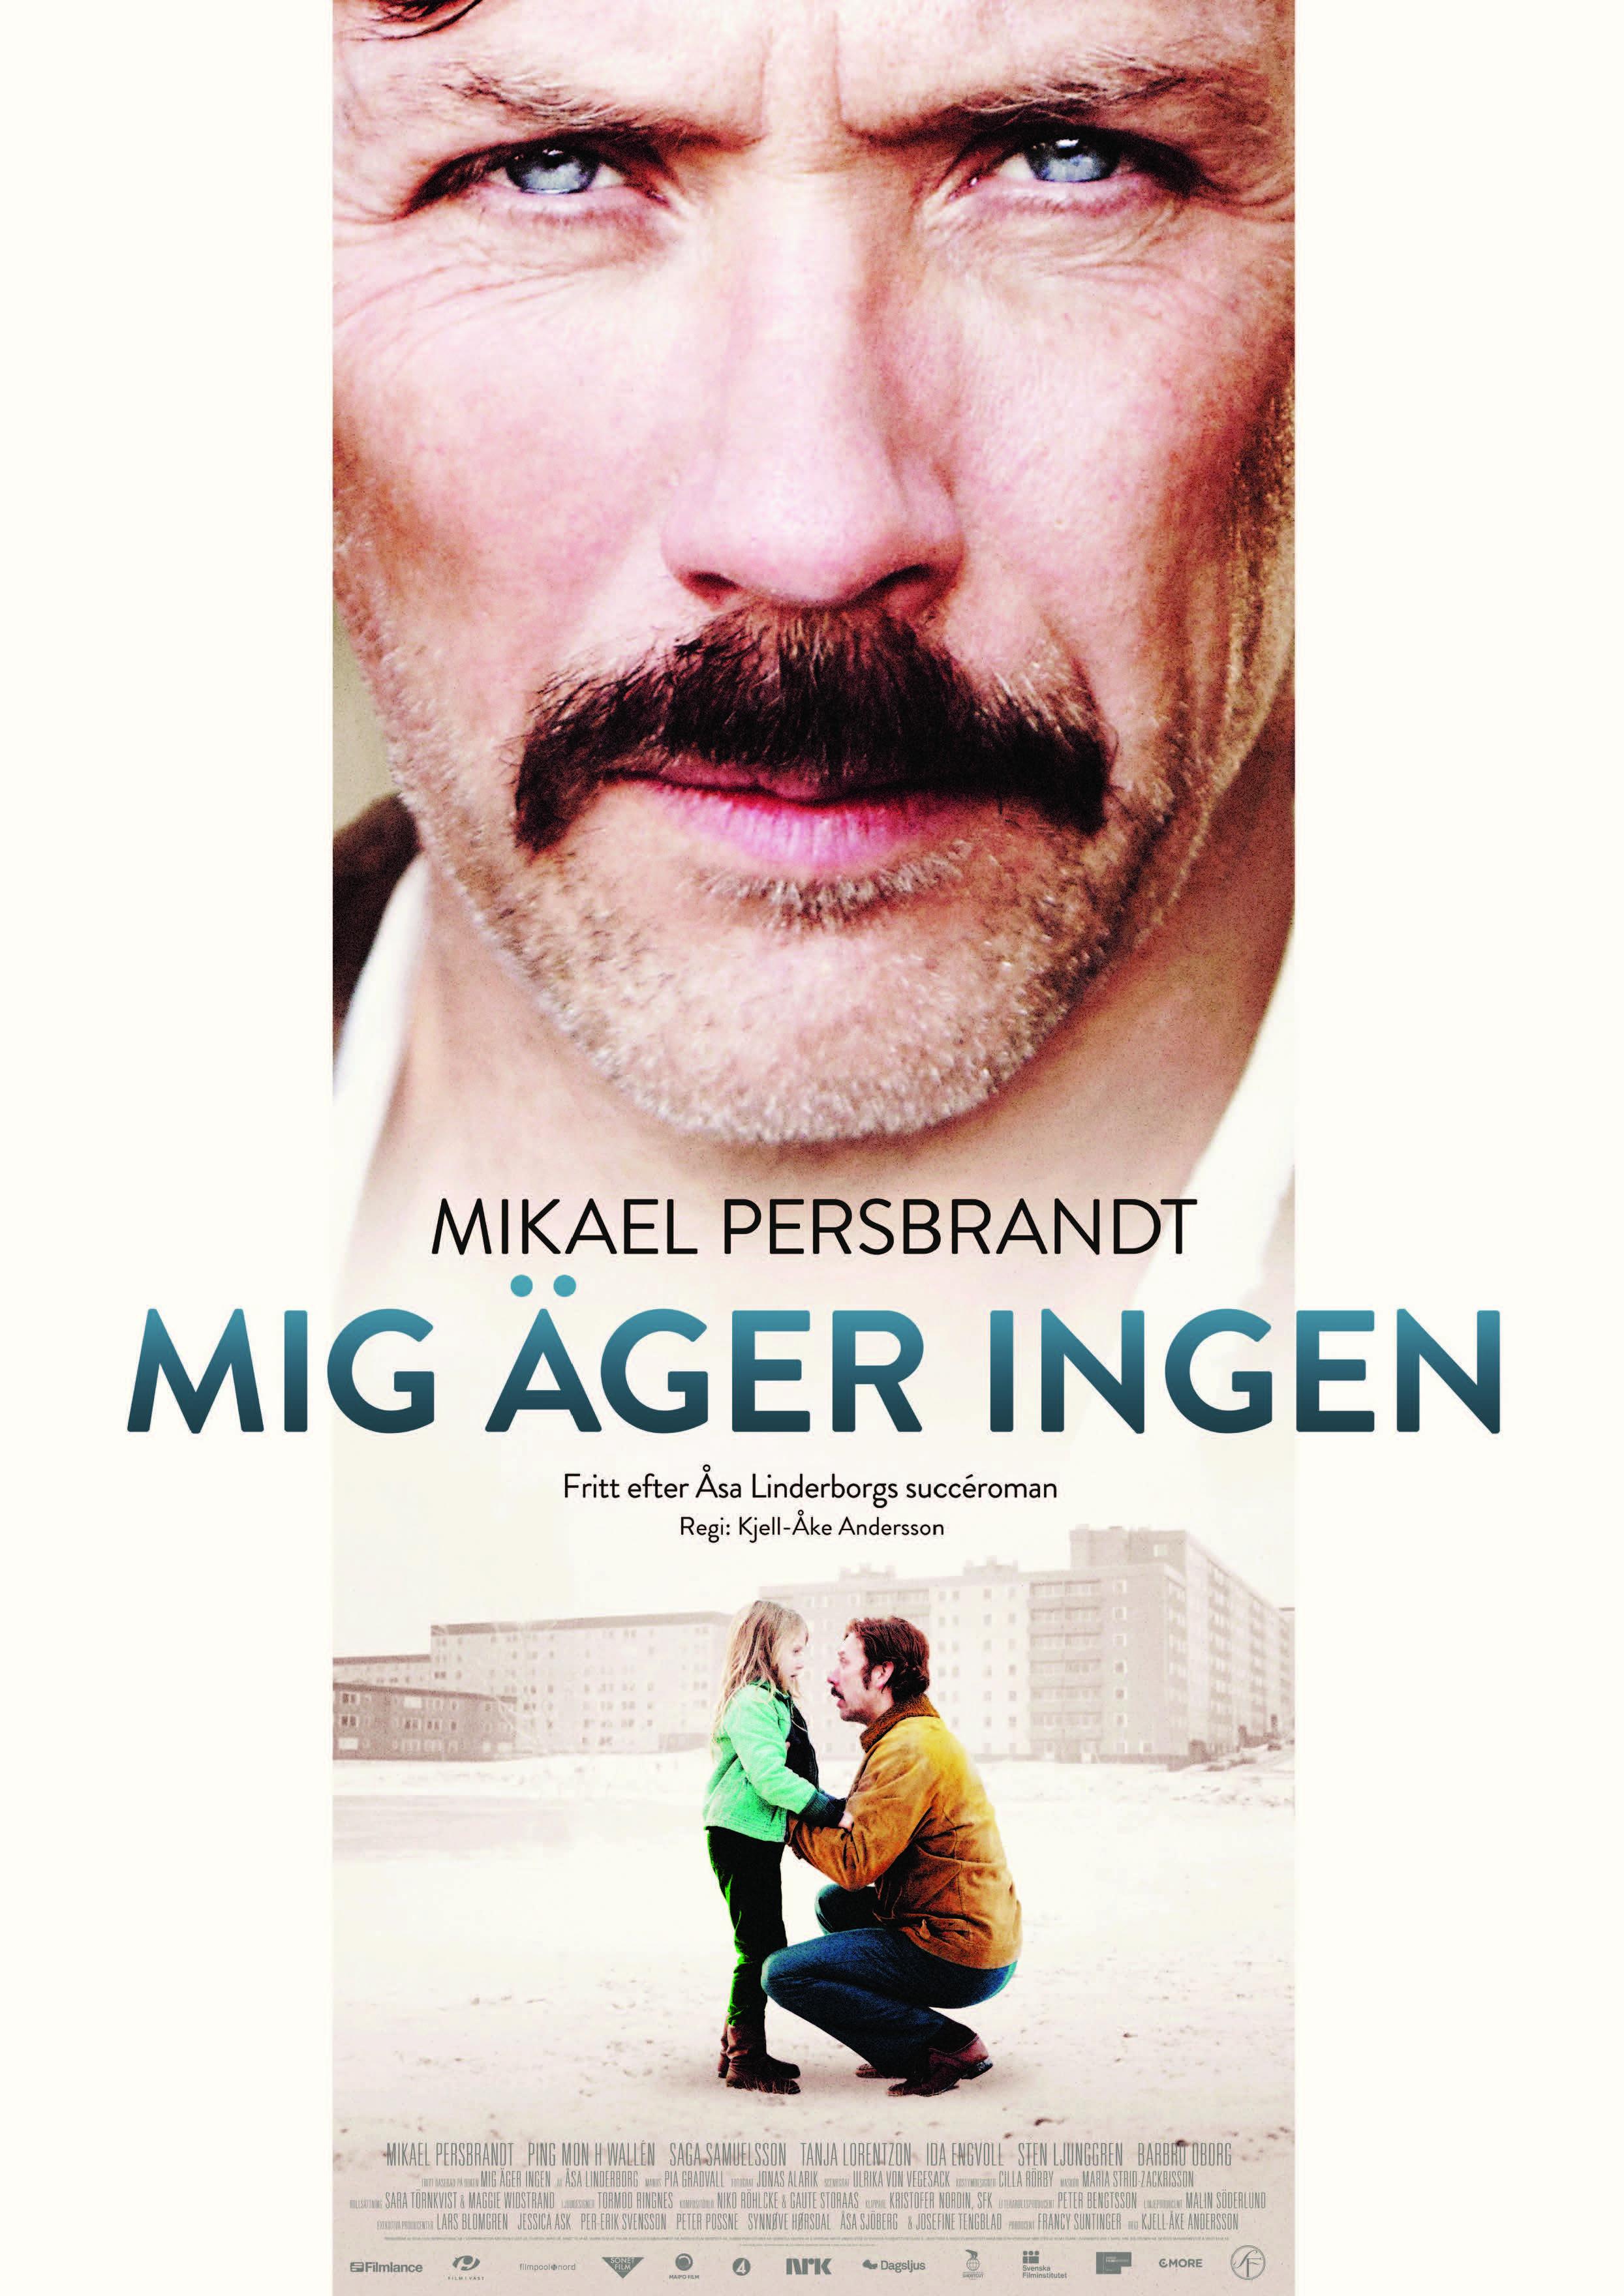 source: https://kurera.se/vinn-biobiljetter-till-filmen-mig-ager-ingen/